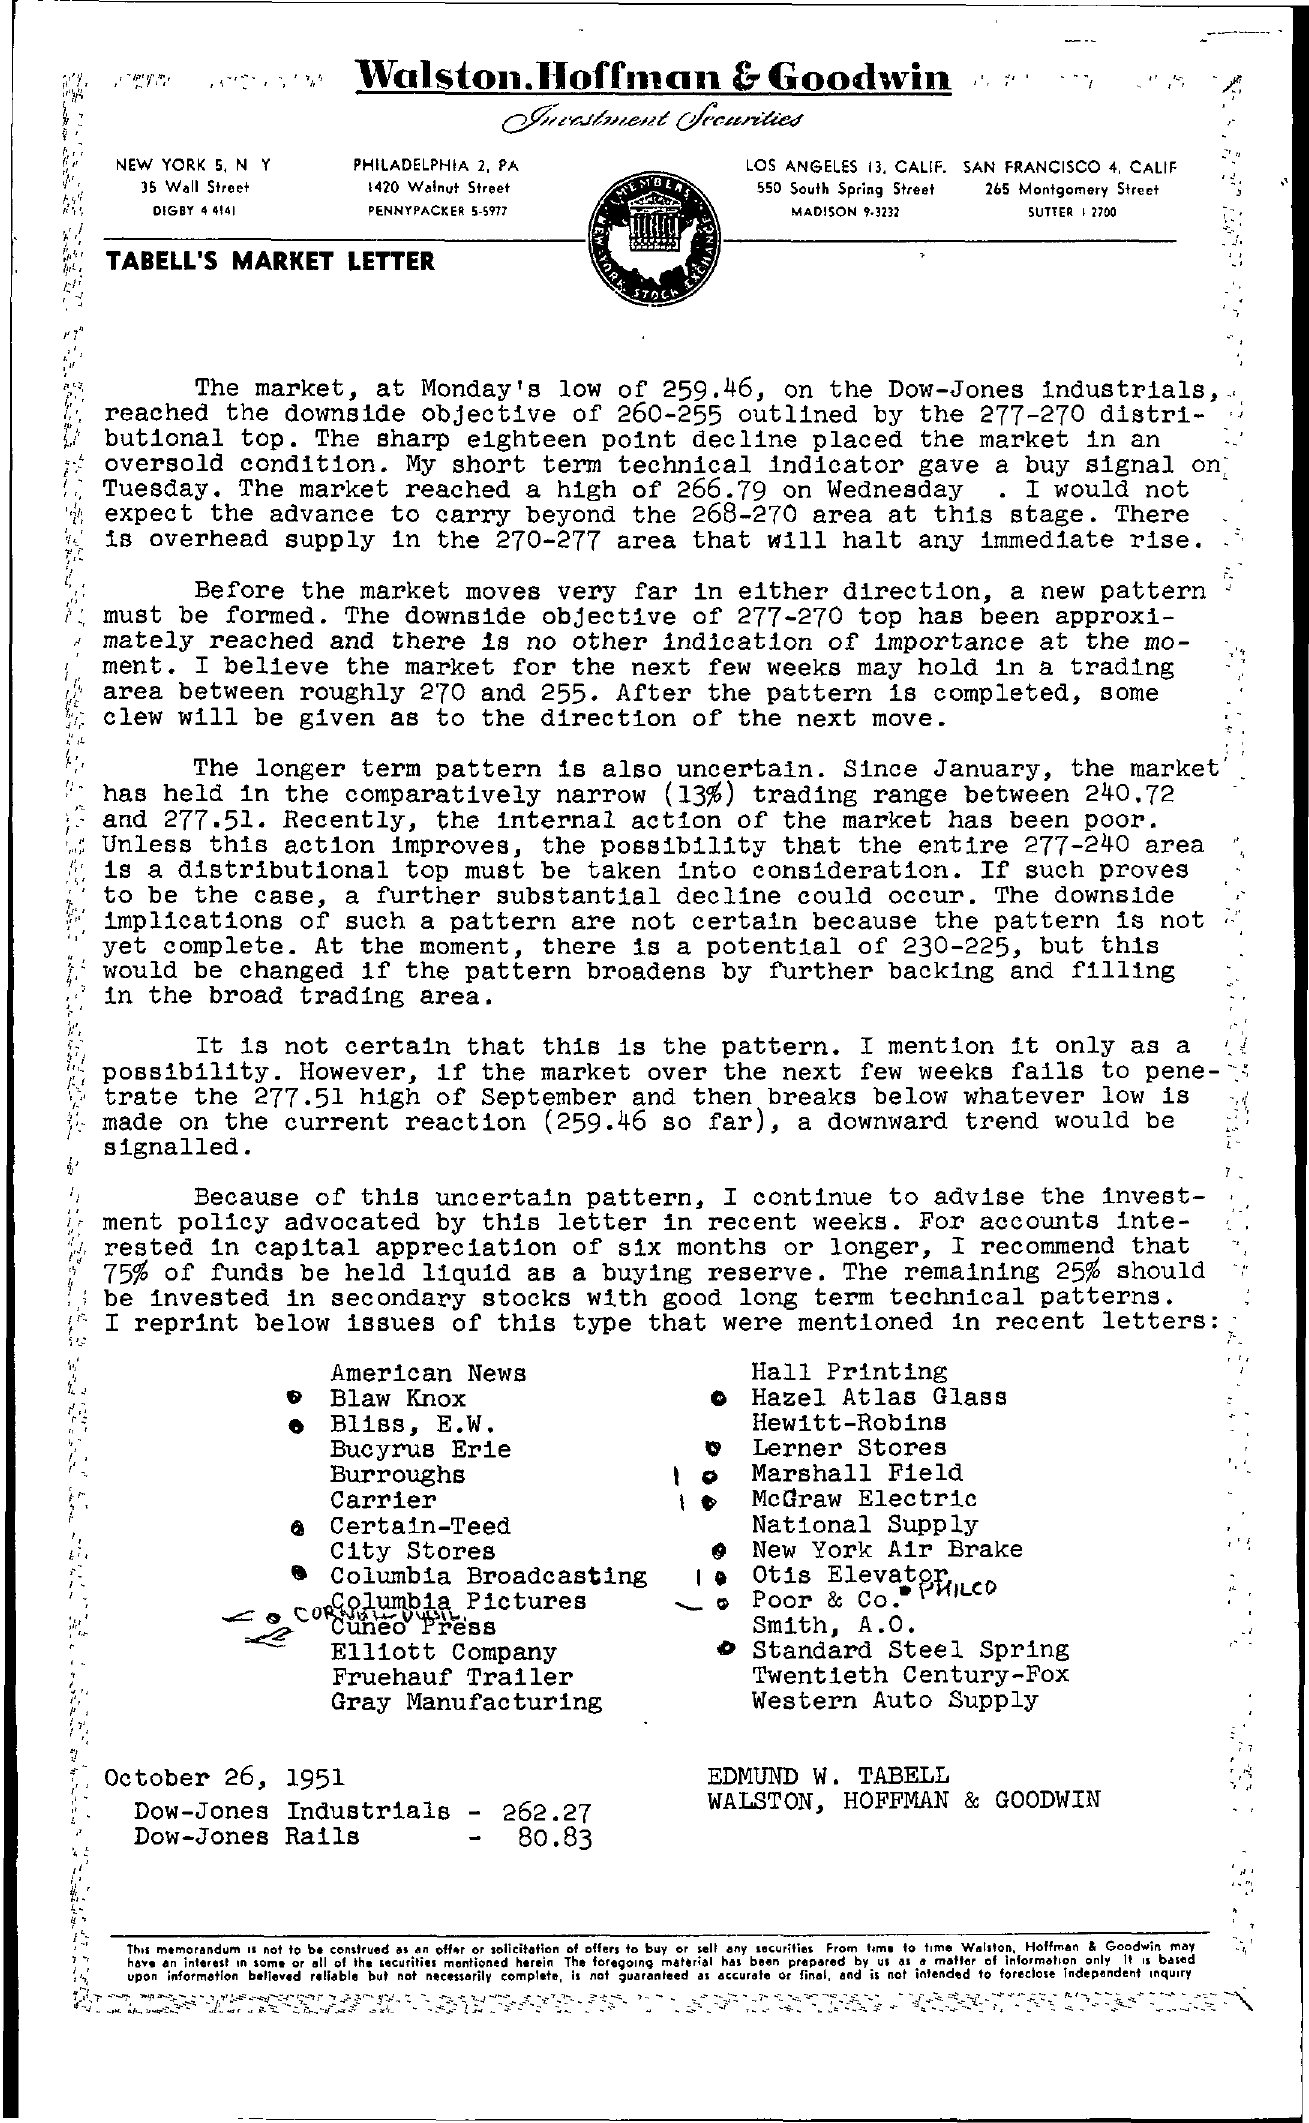 Tabell's Market Letter - October 26, 1951